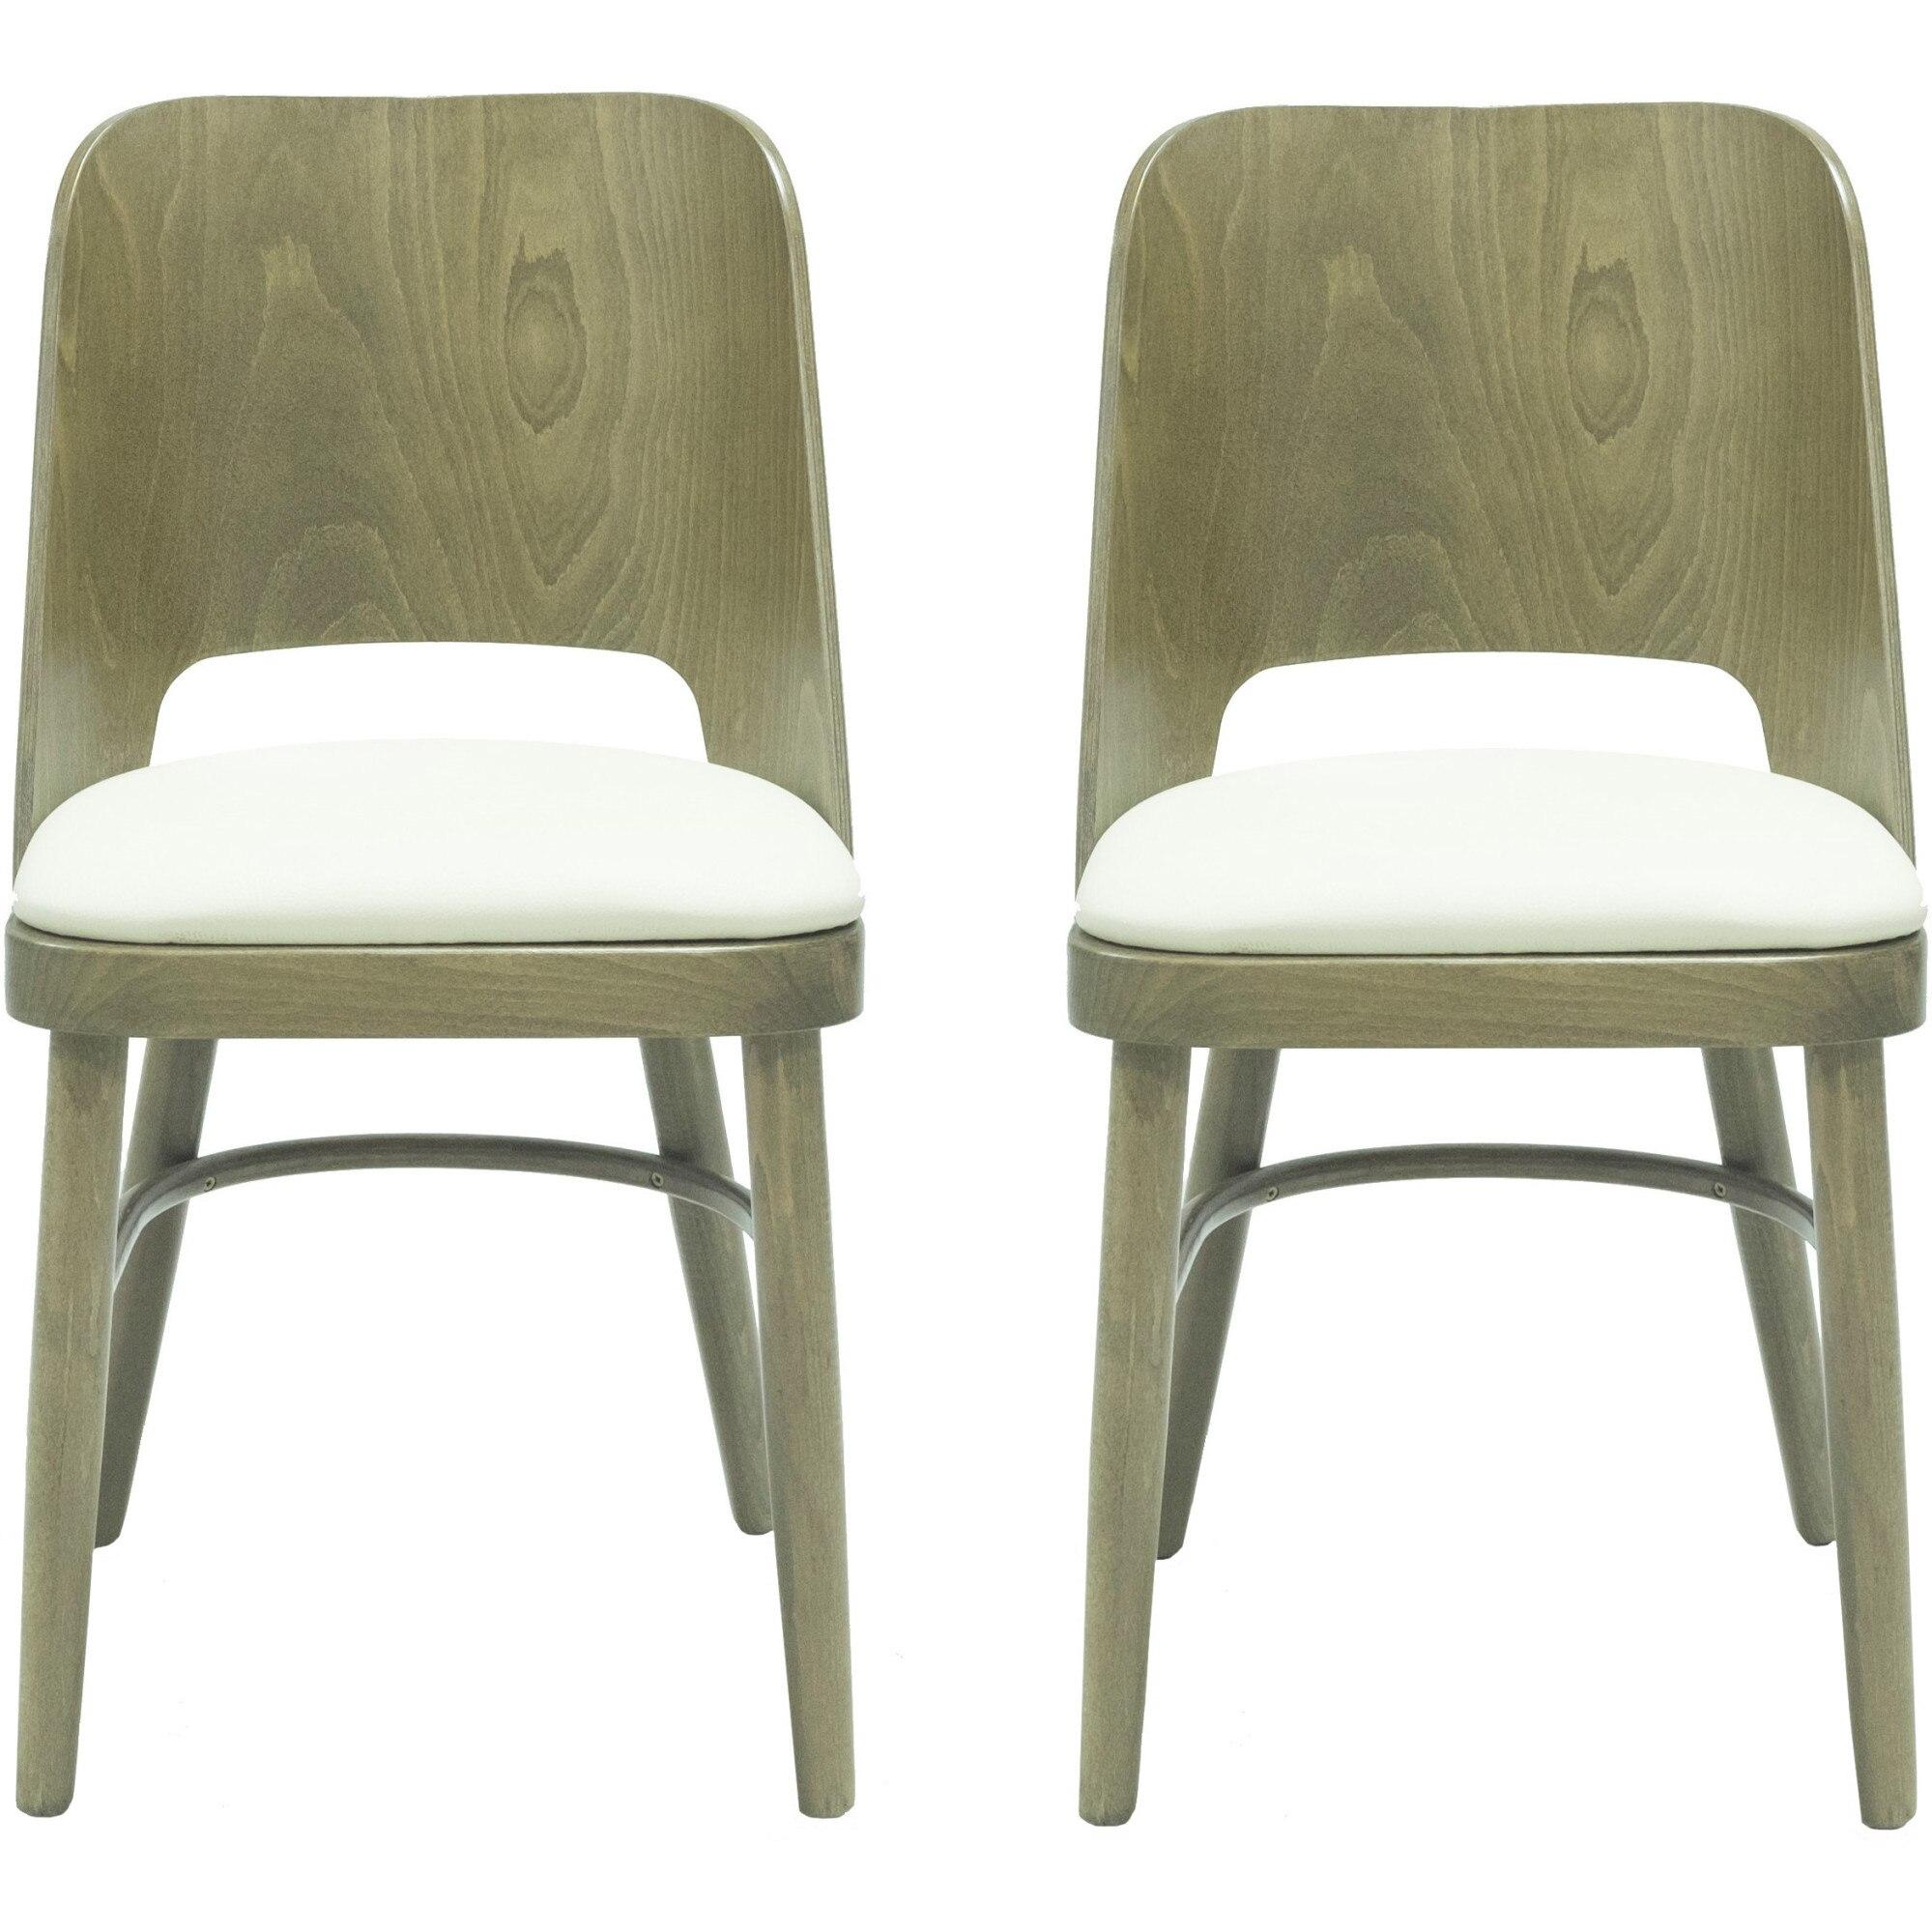 Fotografie Set 2 scaune Kasto Debra, lemn esenta tare, culoare Stejar Dark